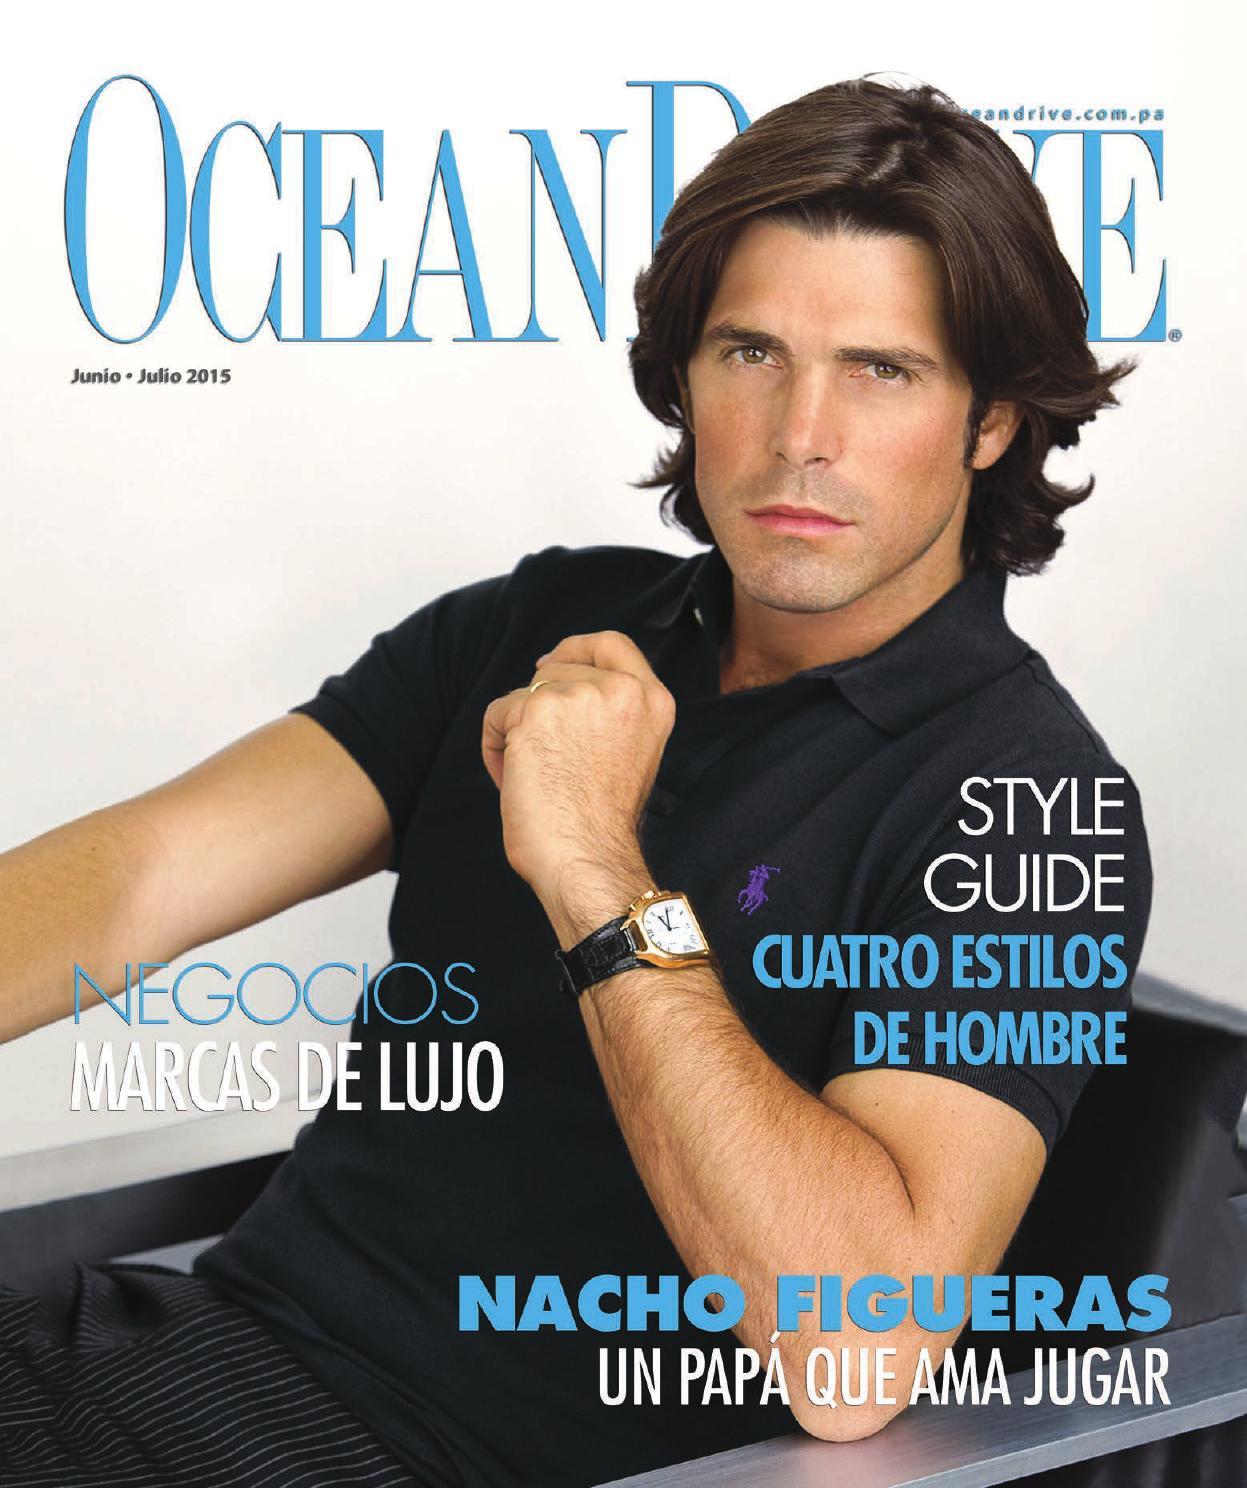 Ocean Drive Panama Junio-Julio 2015 by Ocean Drive Magazine Panama - issuu 5890c0adff5